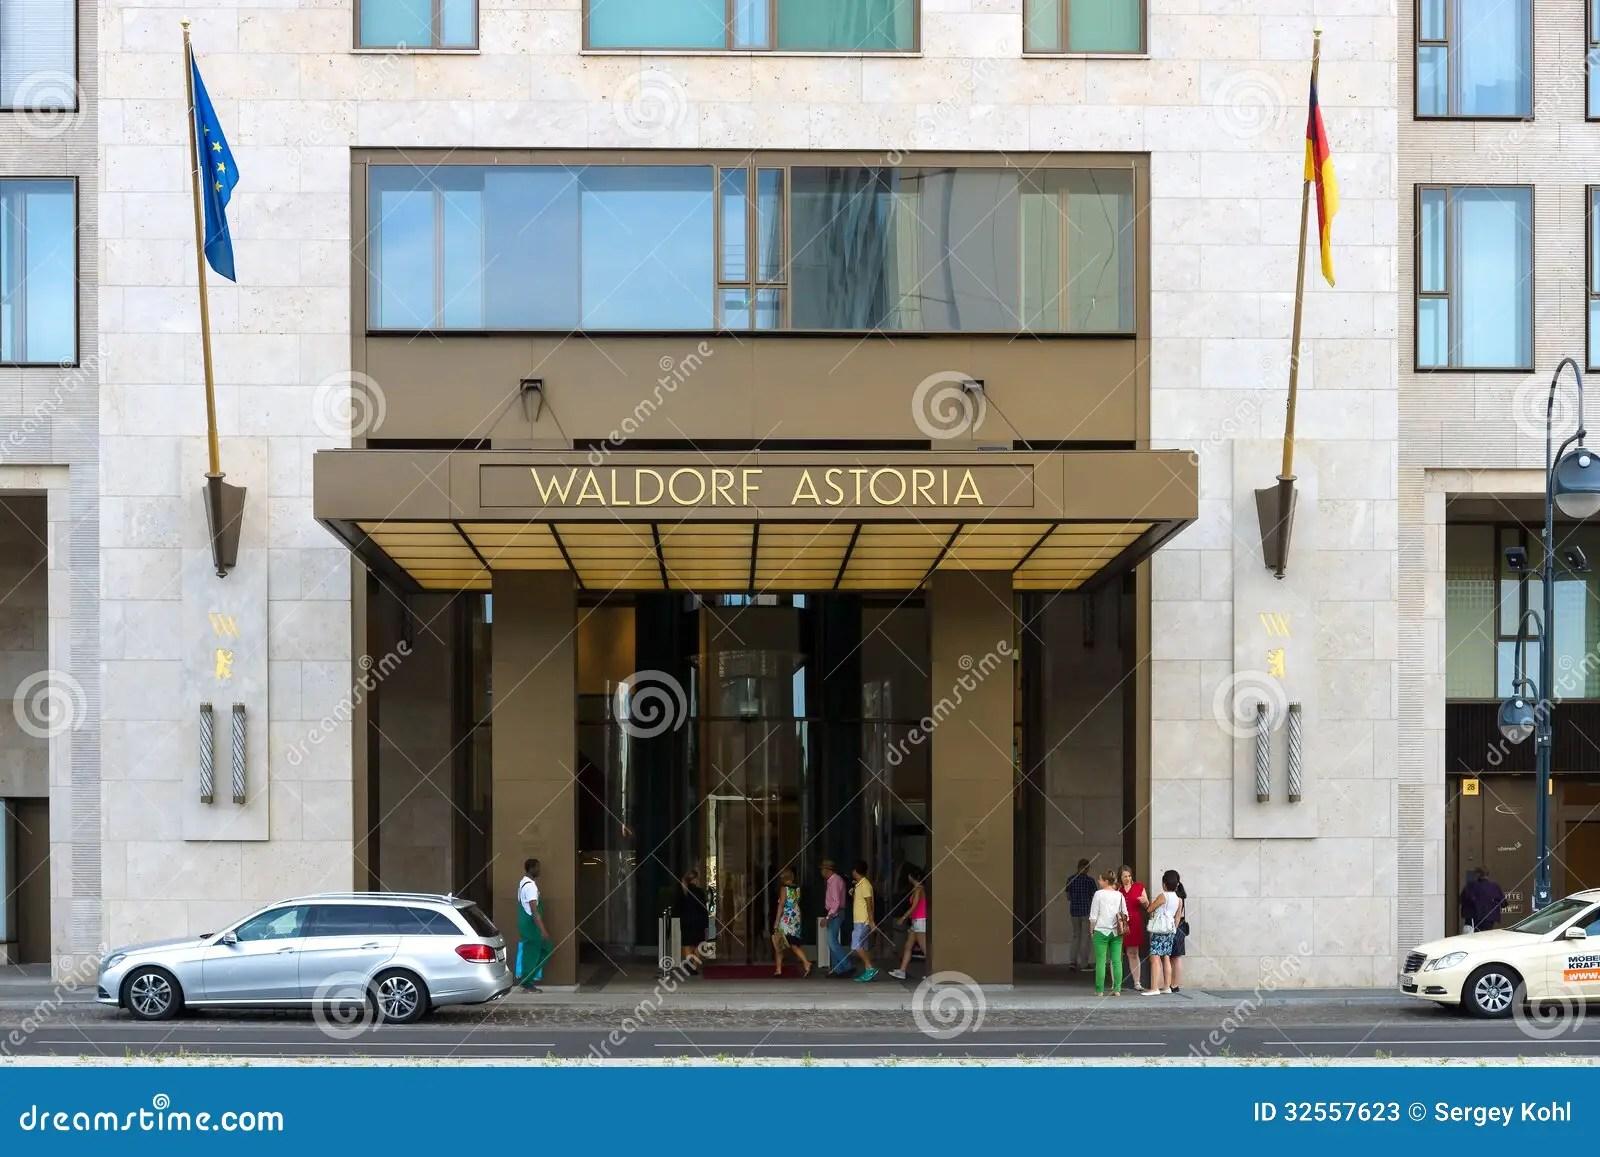 Five Star Hotel Waldorf Astoria Editorial Stock Photo